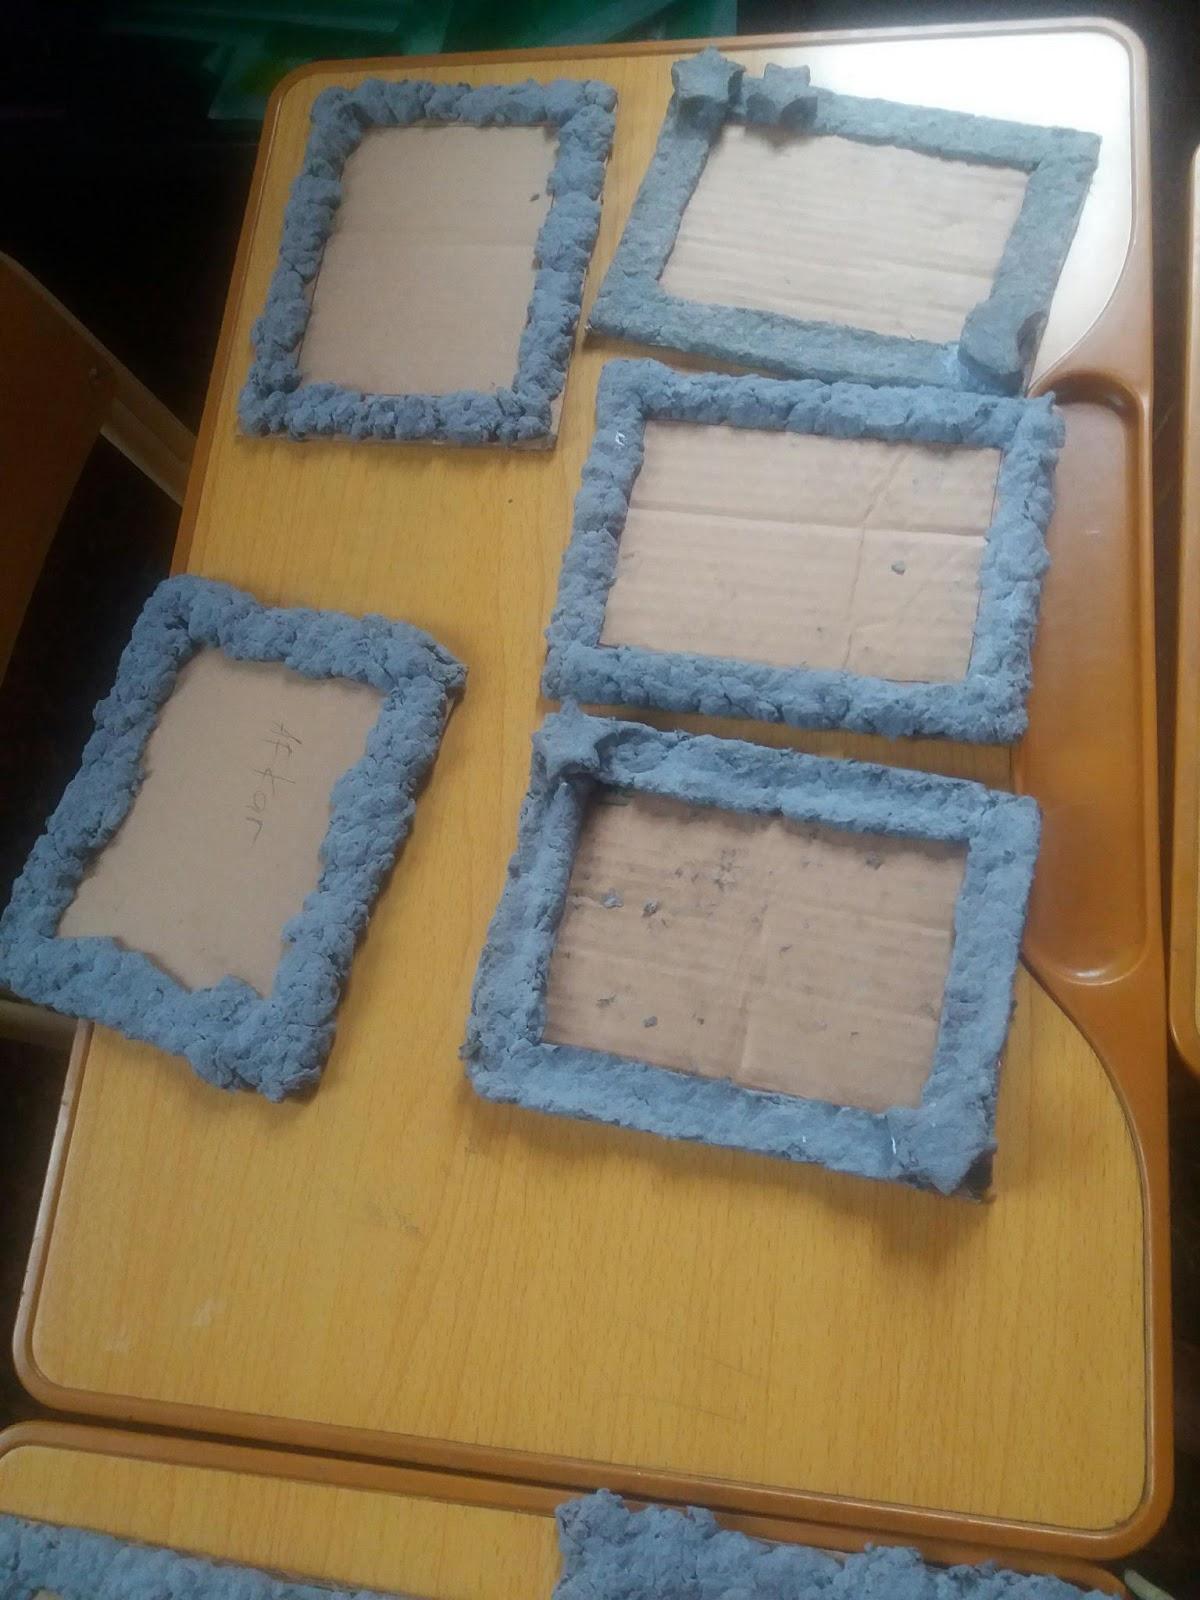 Contoh Kerajinan Dari Bubur Kertas : contoh, kerajinan, bubur, kertas, Koleksi, Gambar, Kolase, Bubur, Kertas, Gratis, Kumpulan